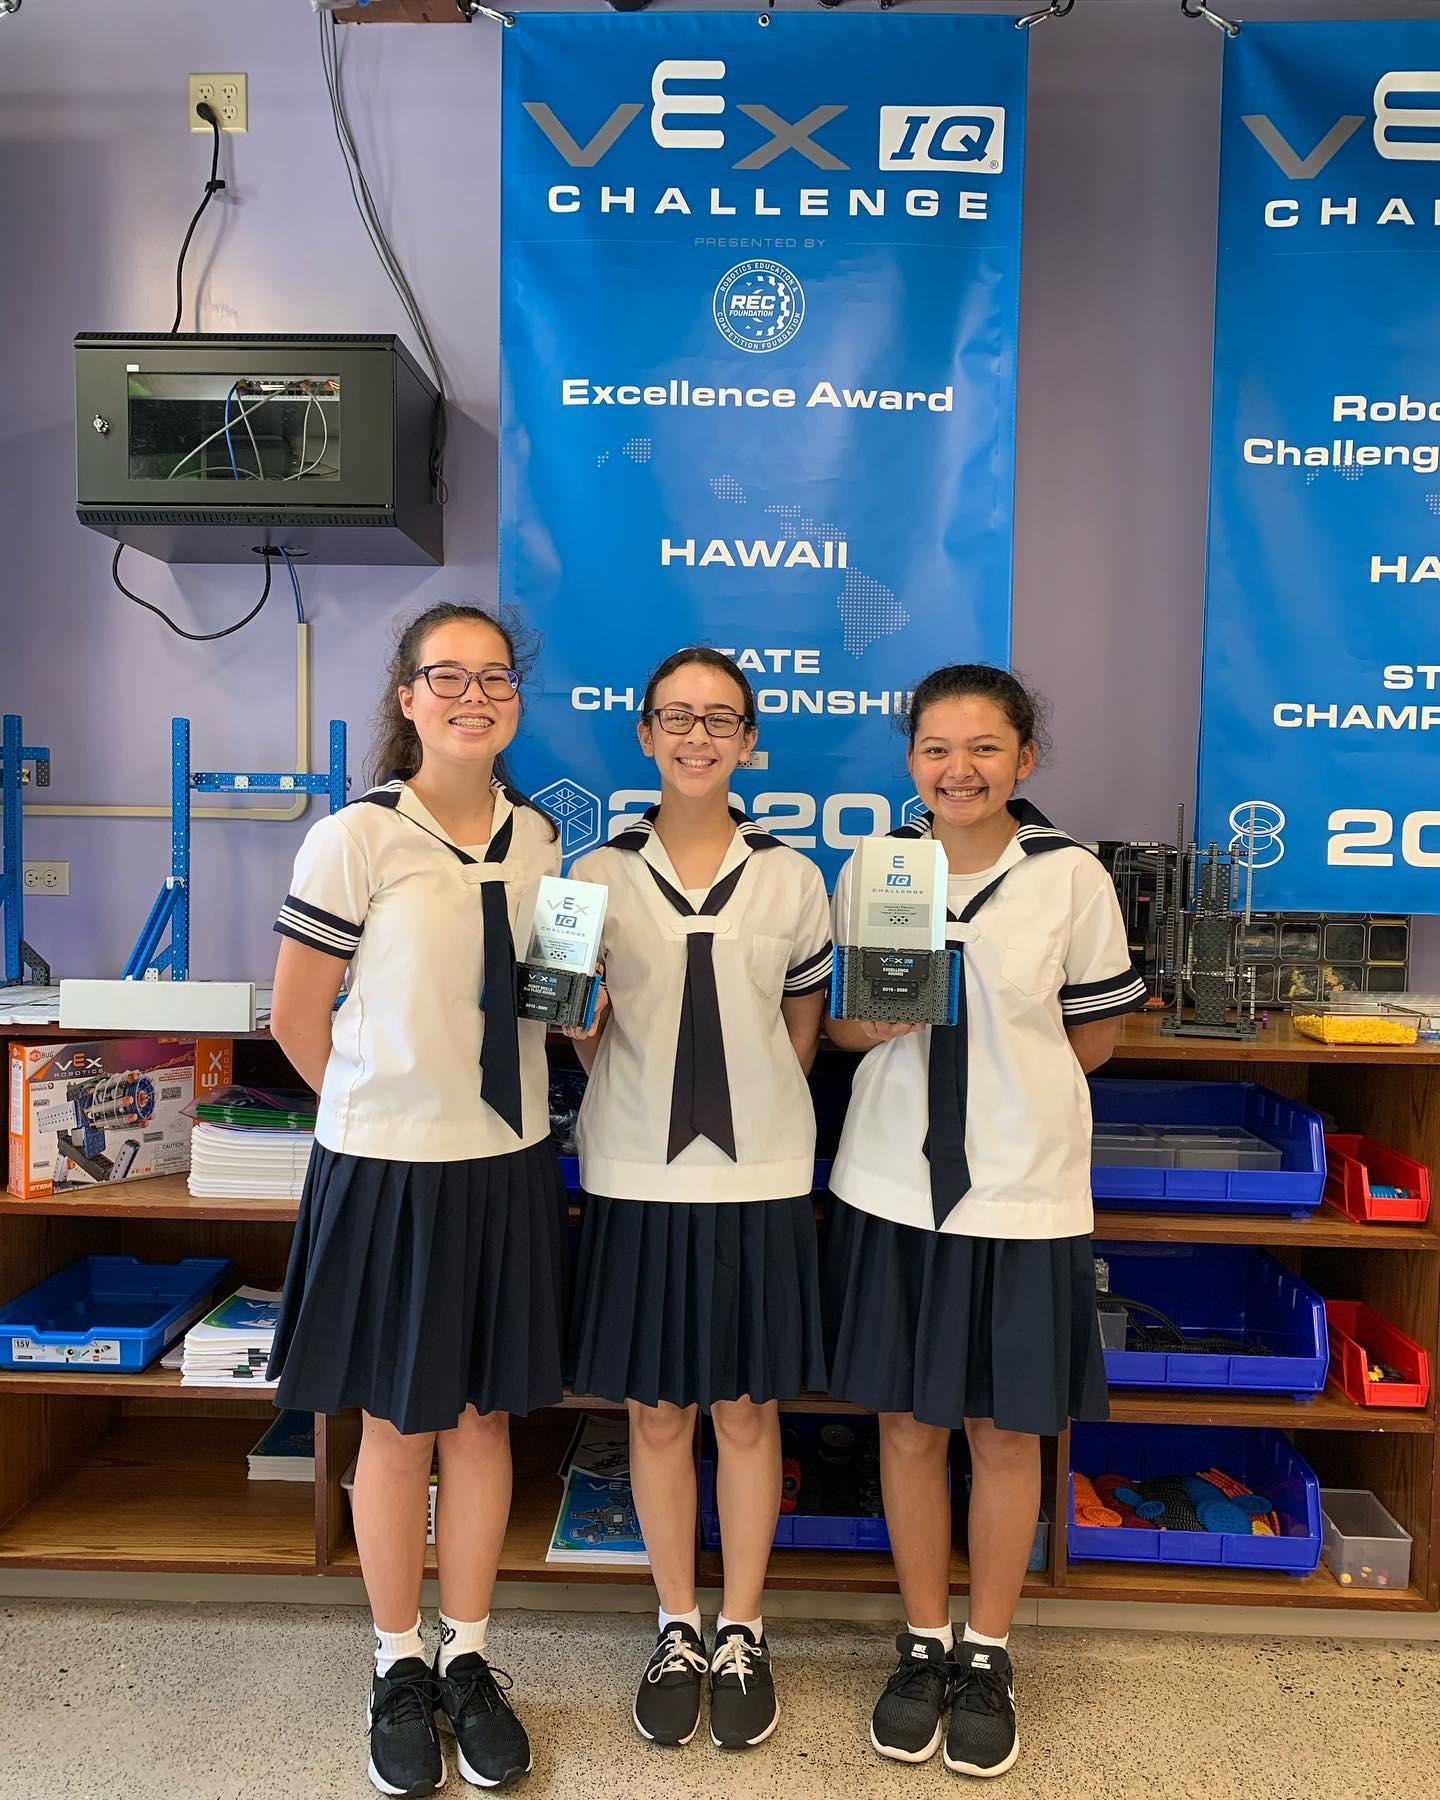 Sacred Hearts Academy Saint Louis Schools Take Top Vex Iq Robotics Awards Hawaii Tech Vexed heart art & design set up at north baldwin chamber of commerce market days. vex iq robotics awards hawaii tech